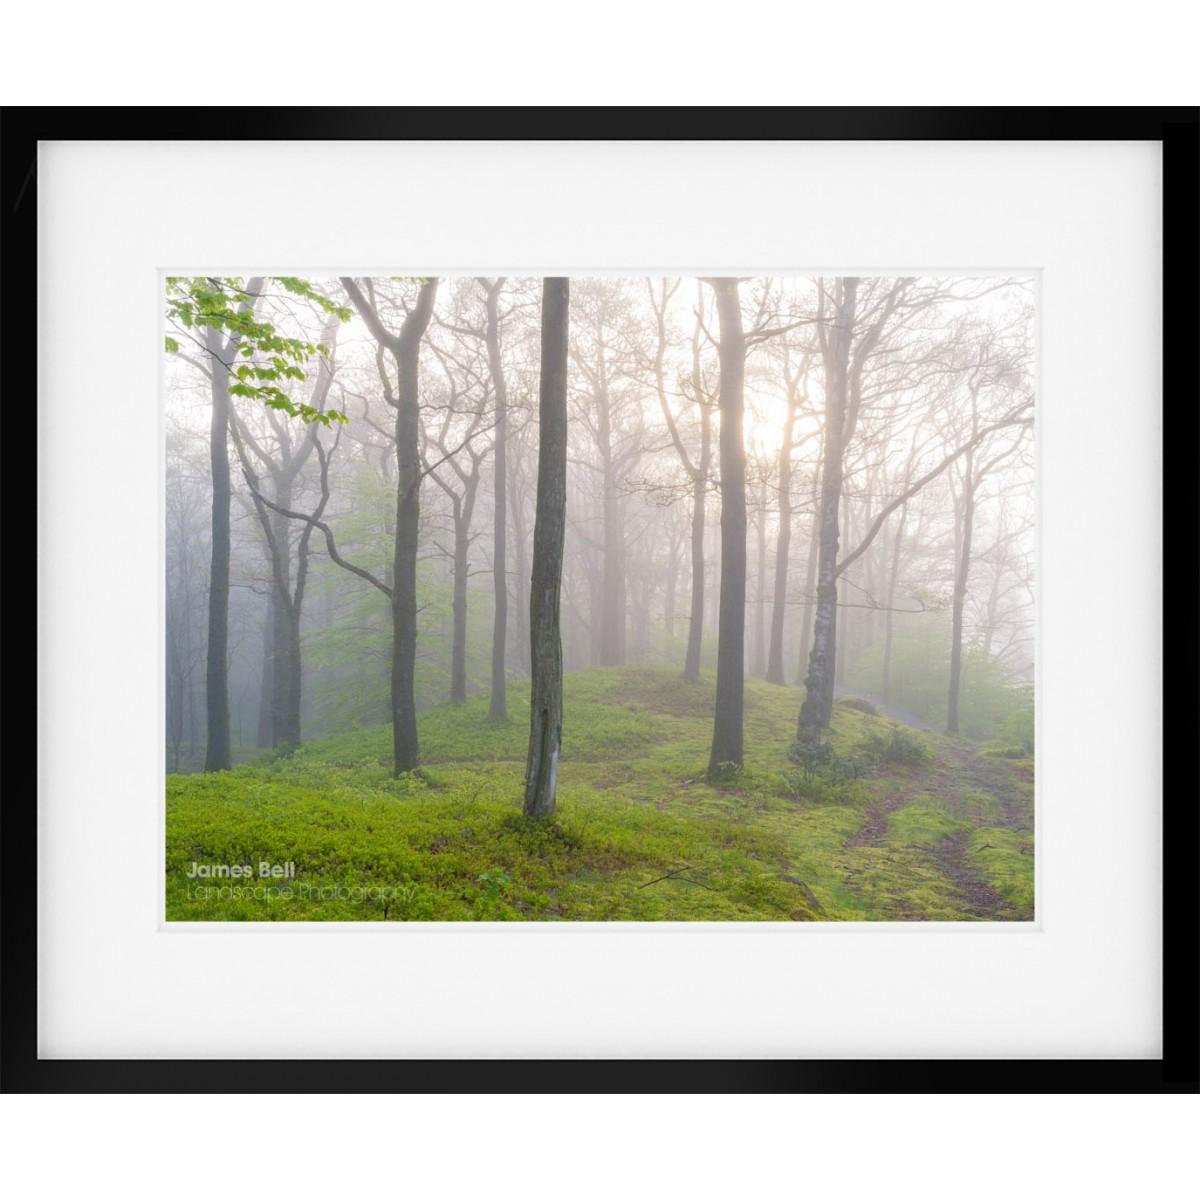 Woodland Wonders framed print